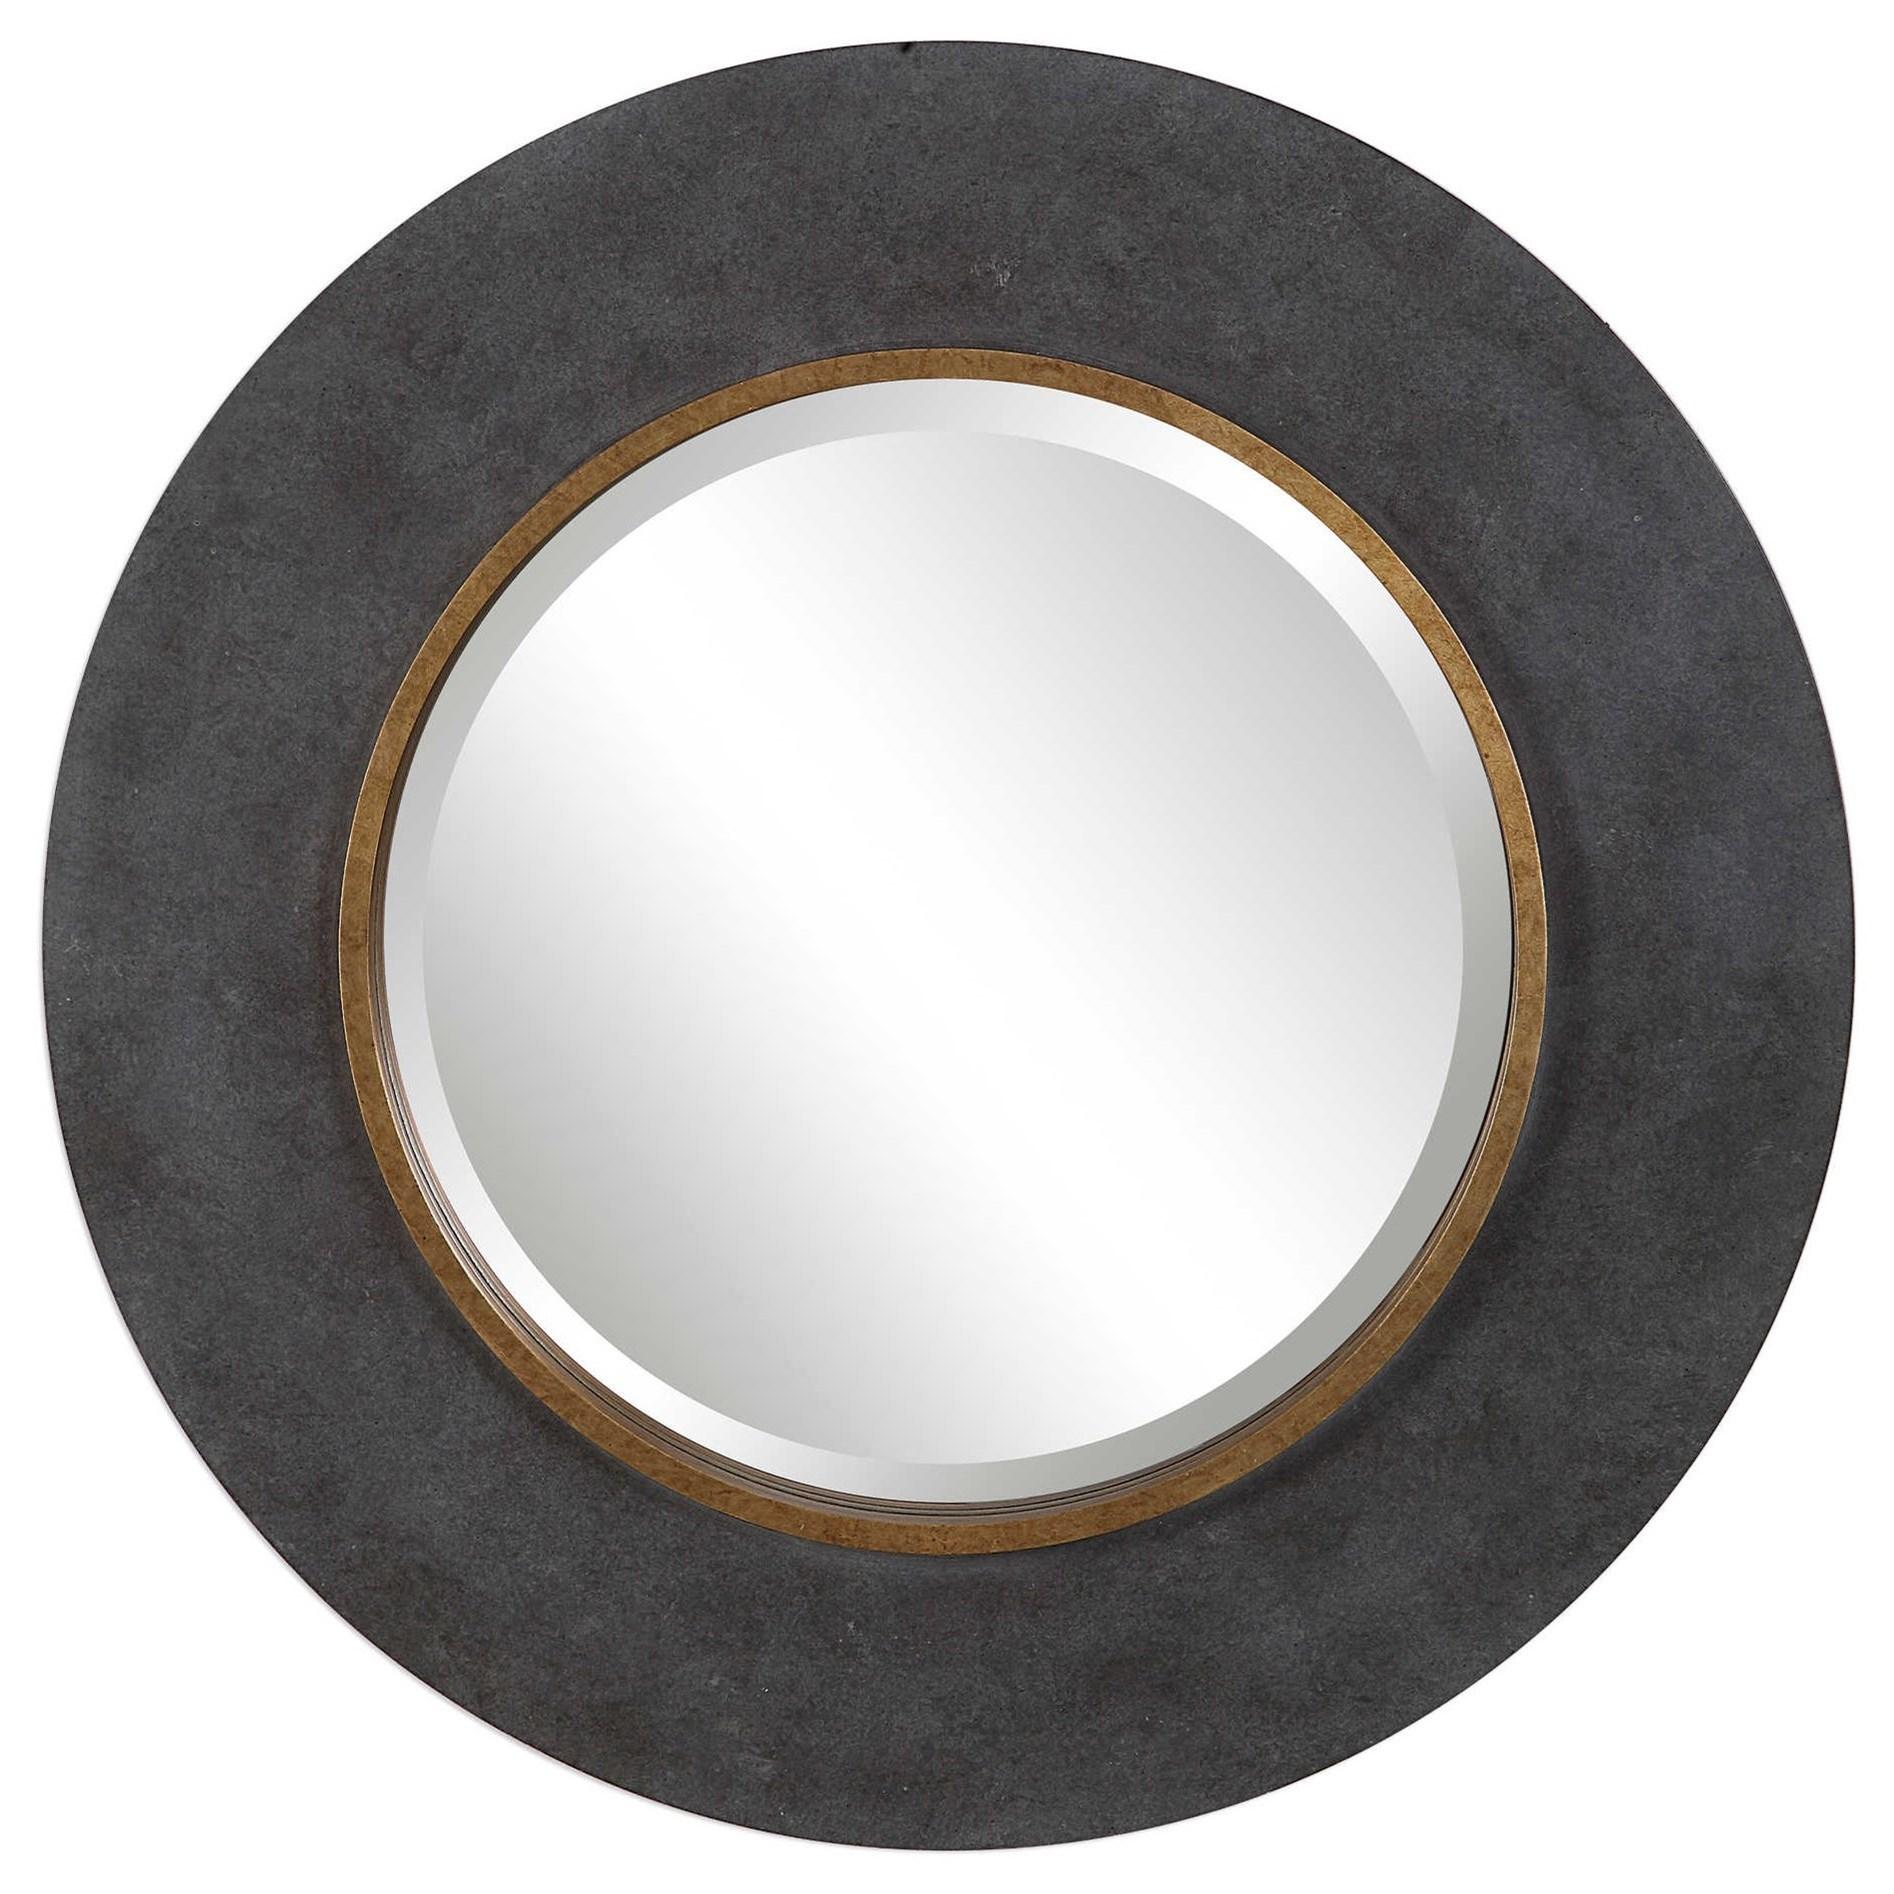 Mirrors - Round Saul Round Mirror by Uttermost at Miller Waldrop Furniture and Decor